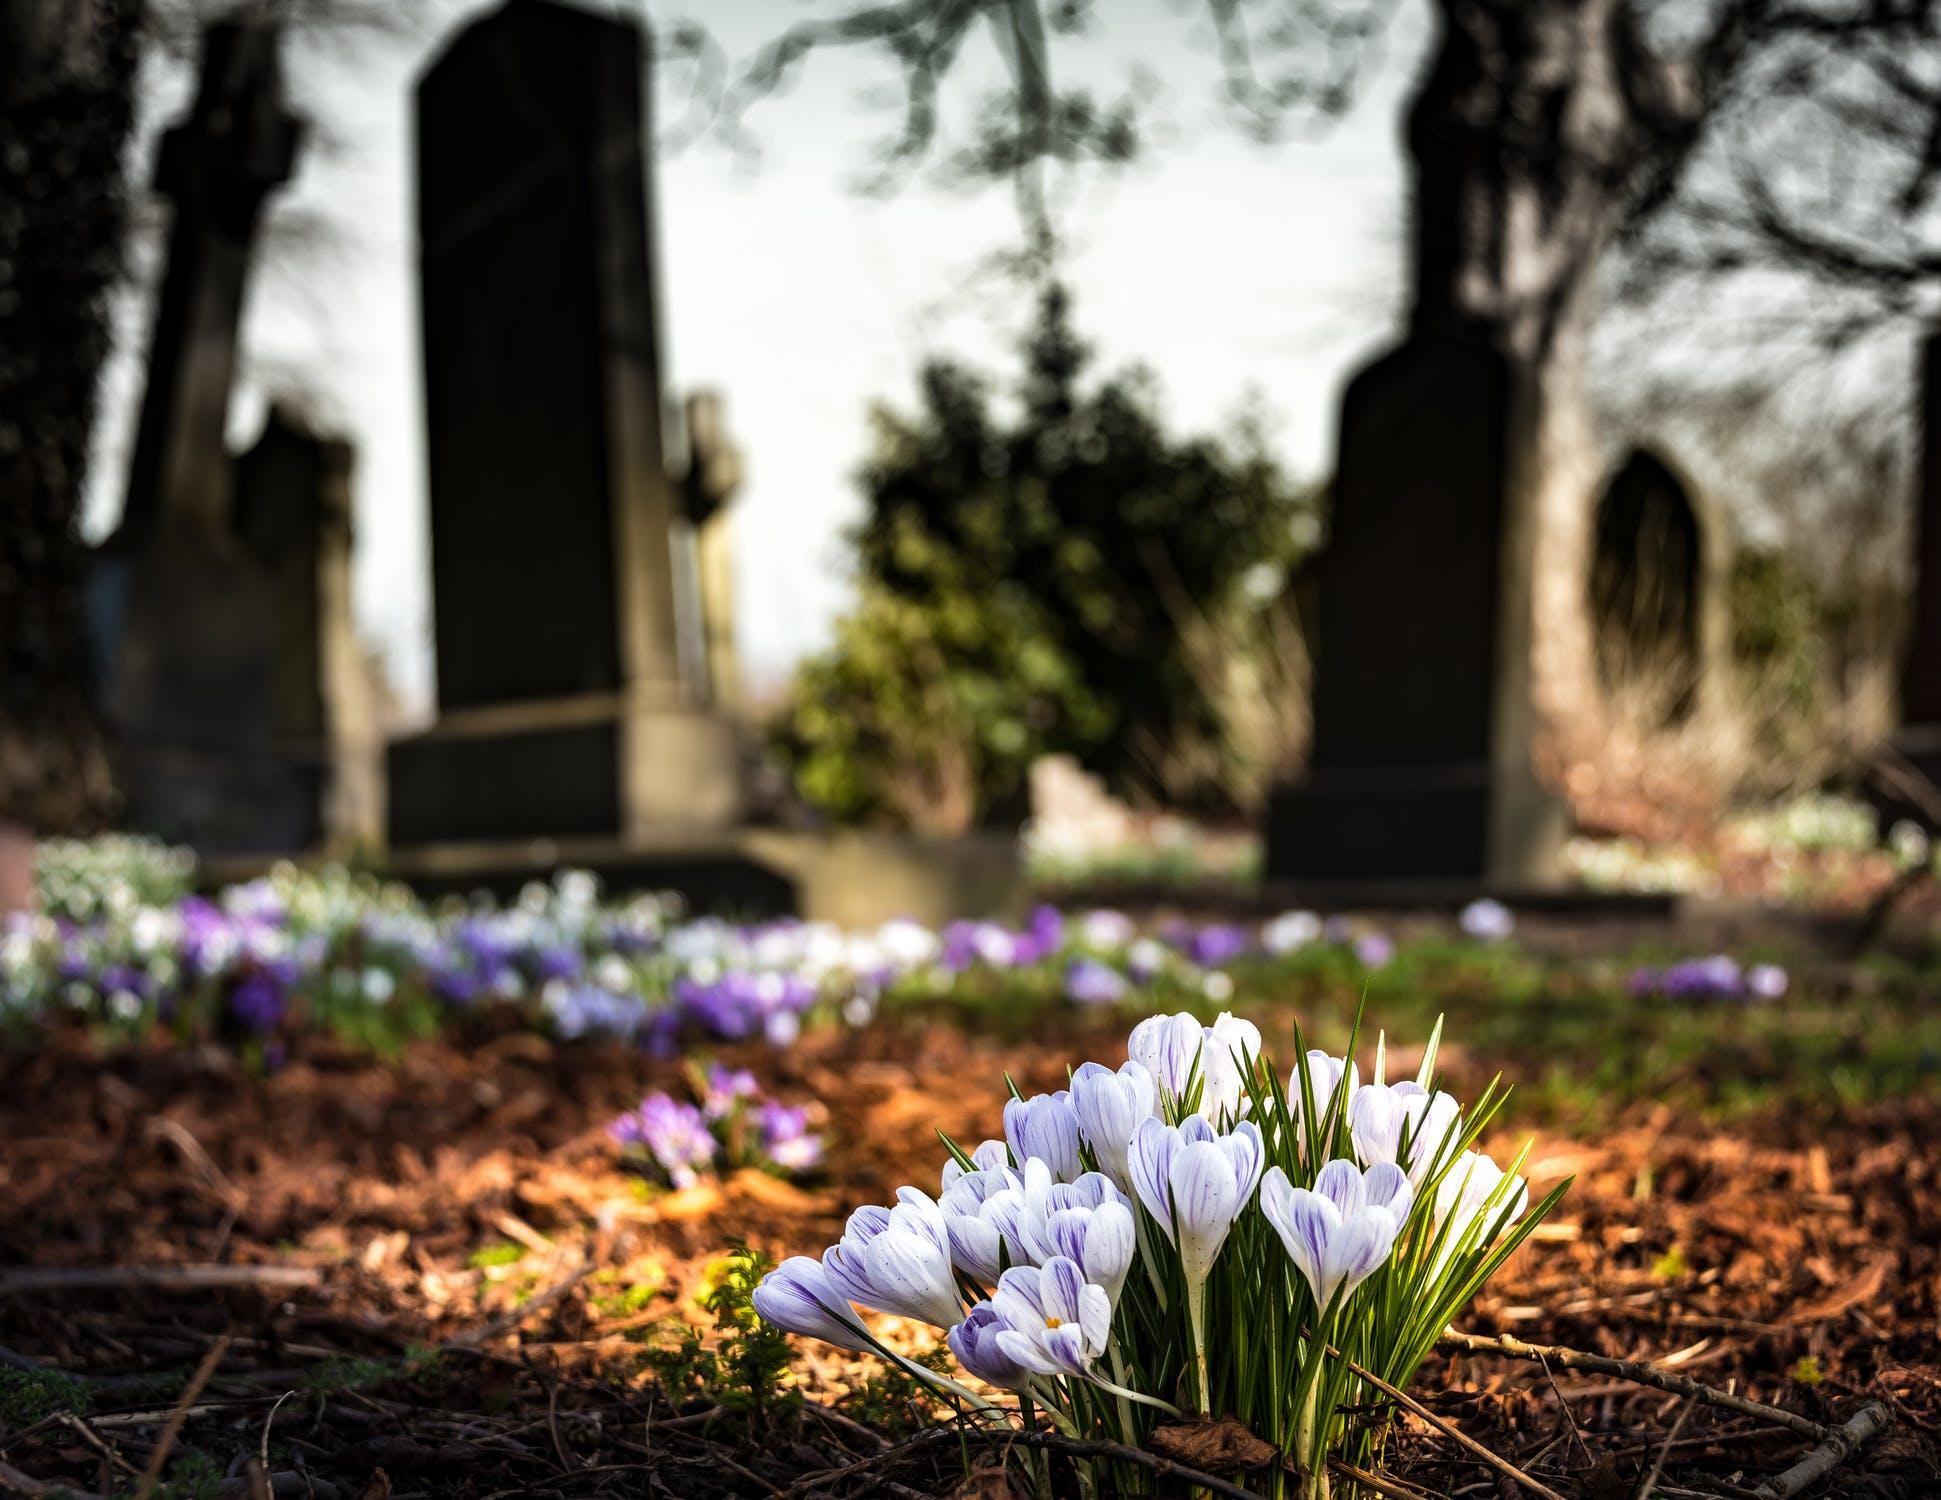 Local St. Louis Cemeteries